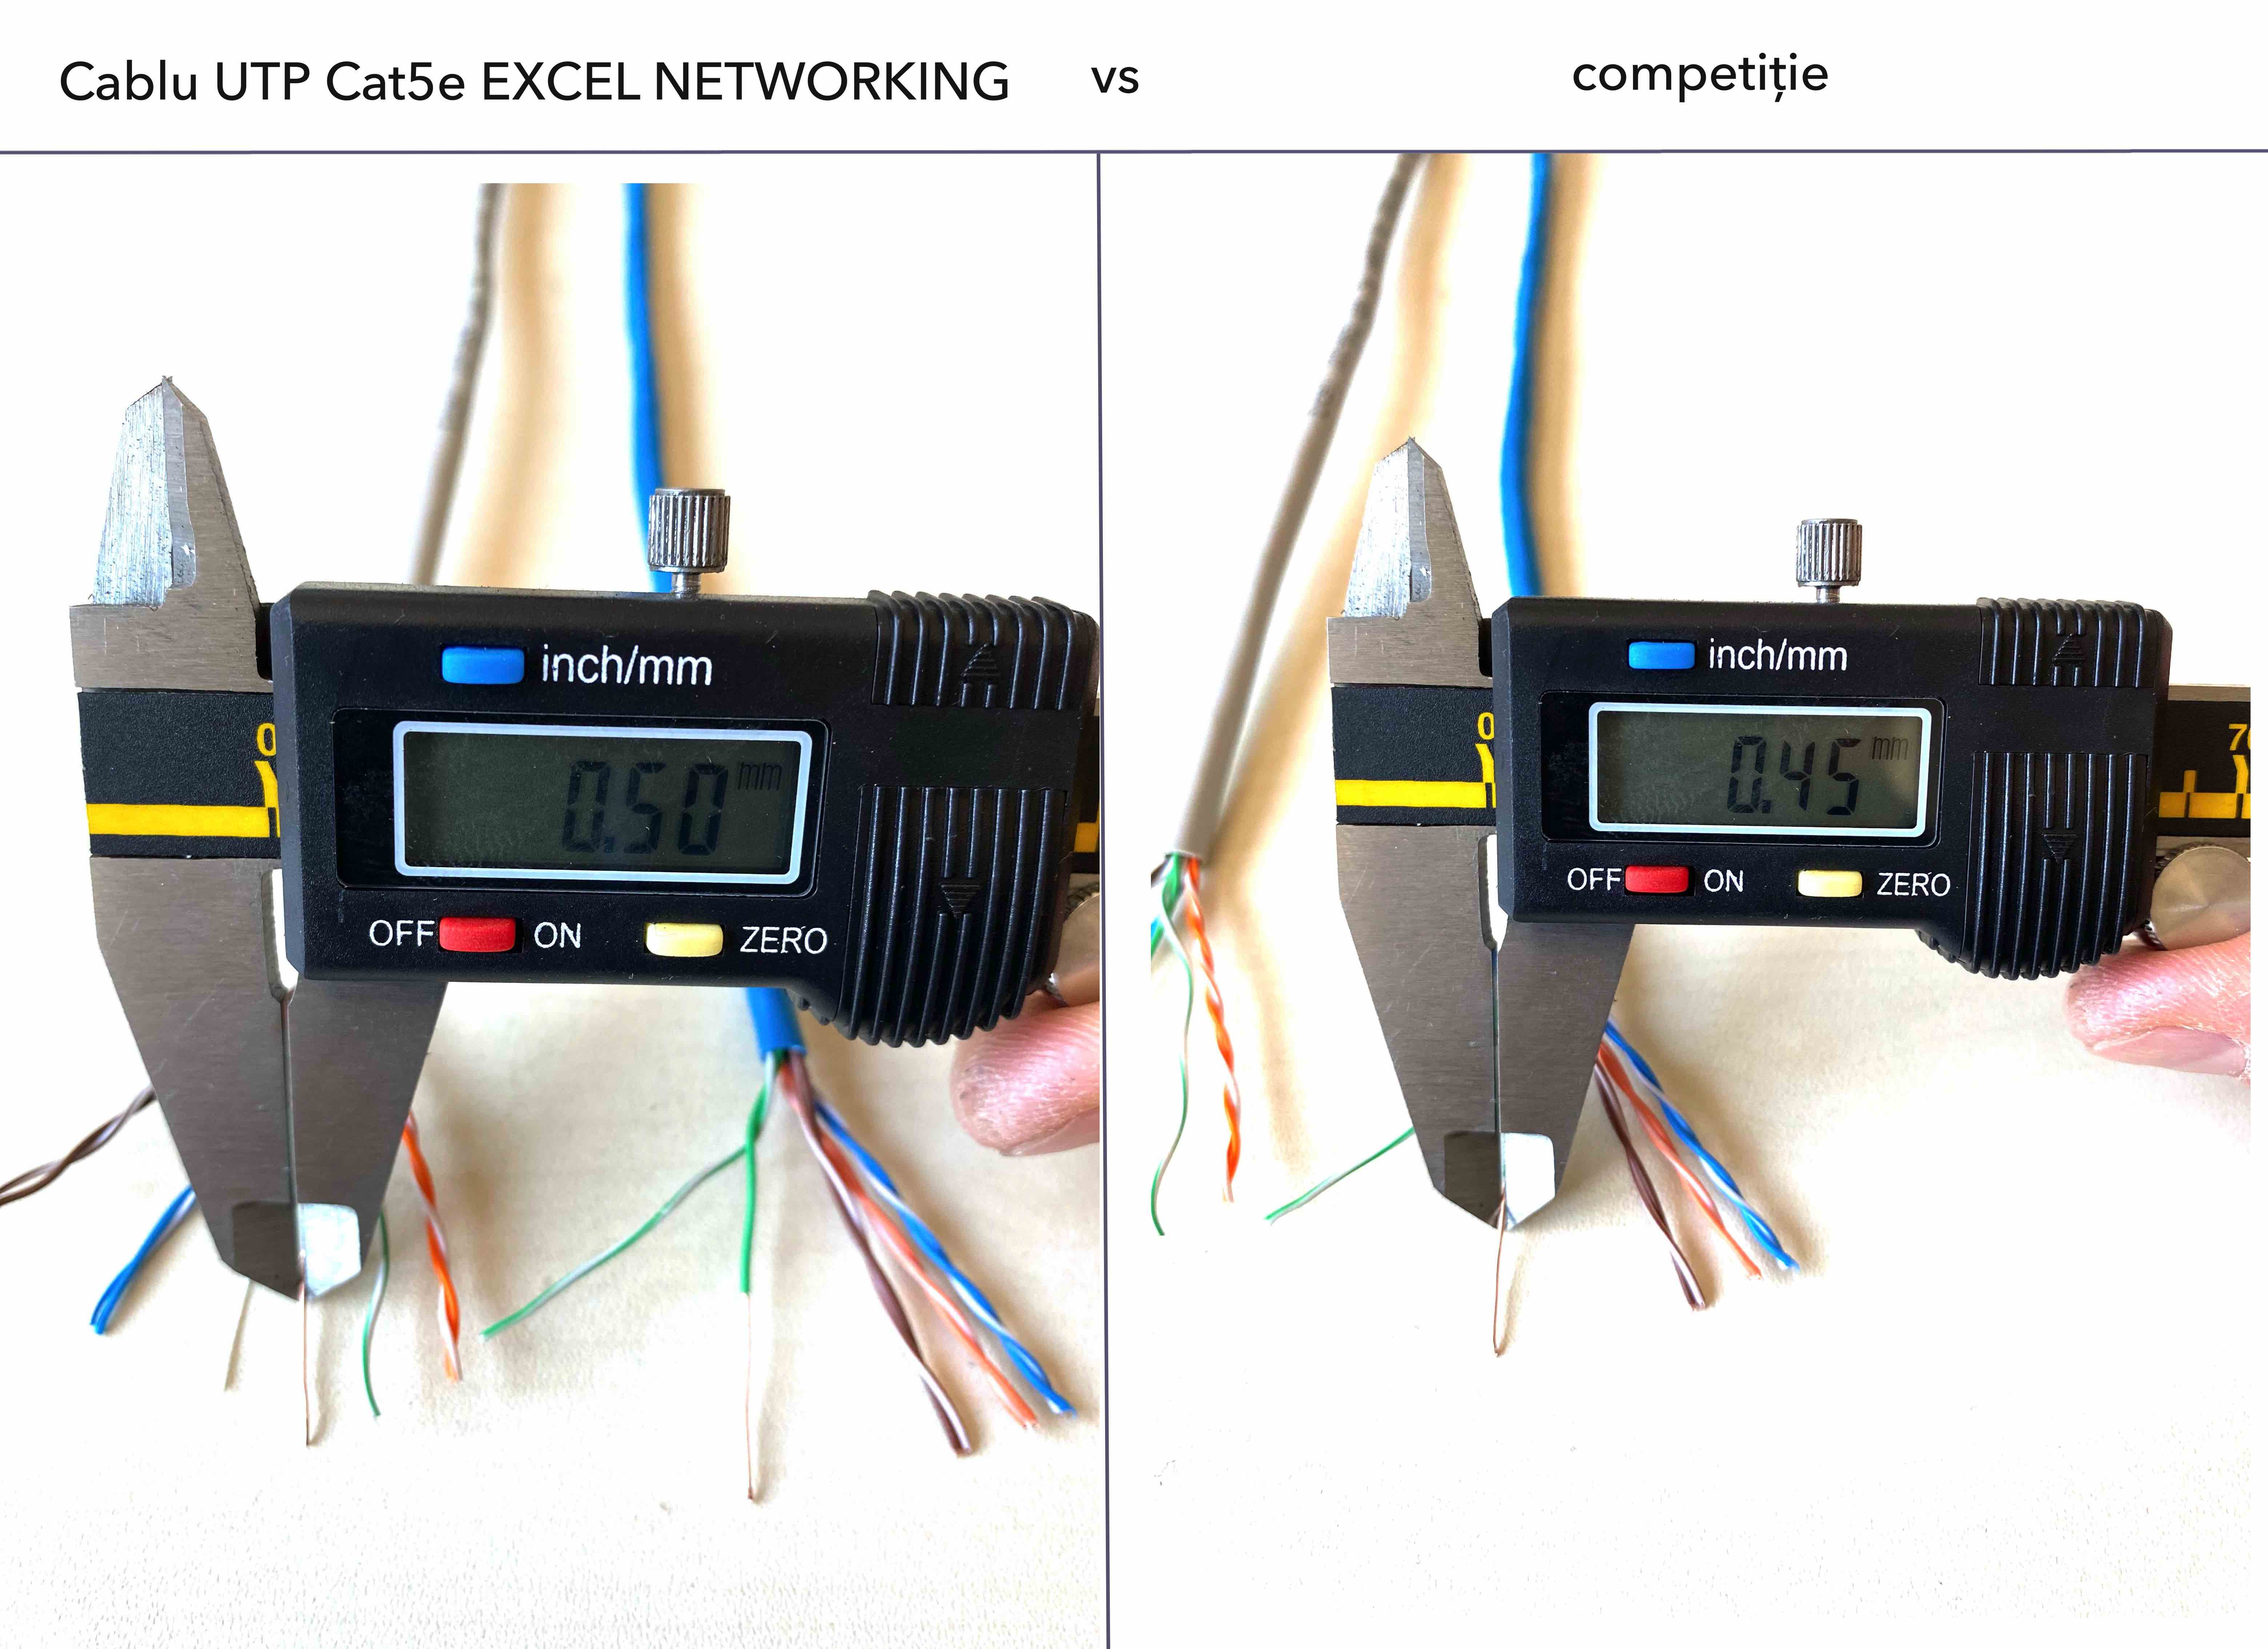 comparatie-cupru-Excel-Networking-2